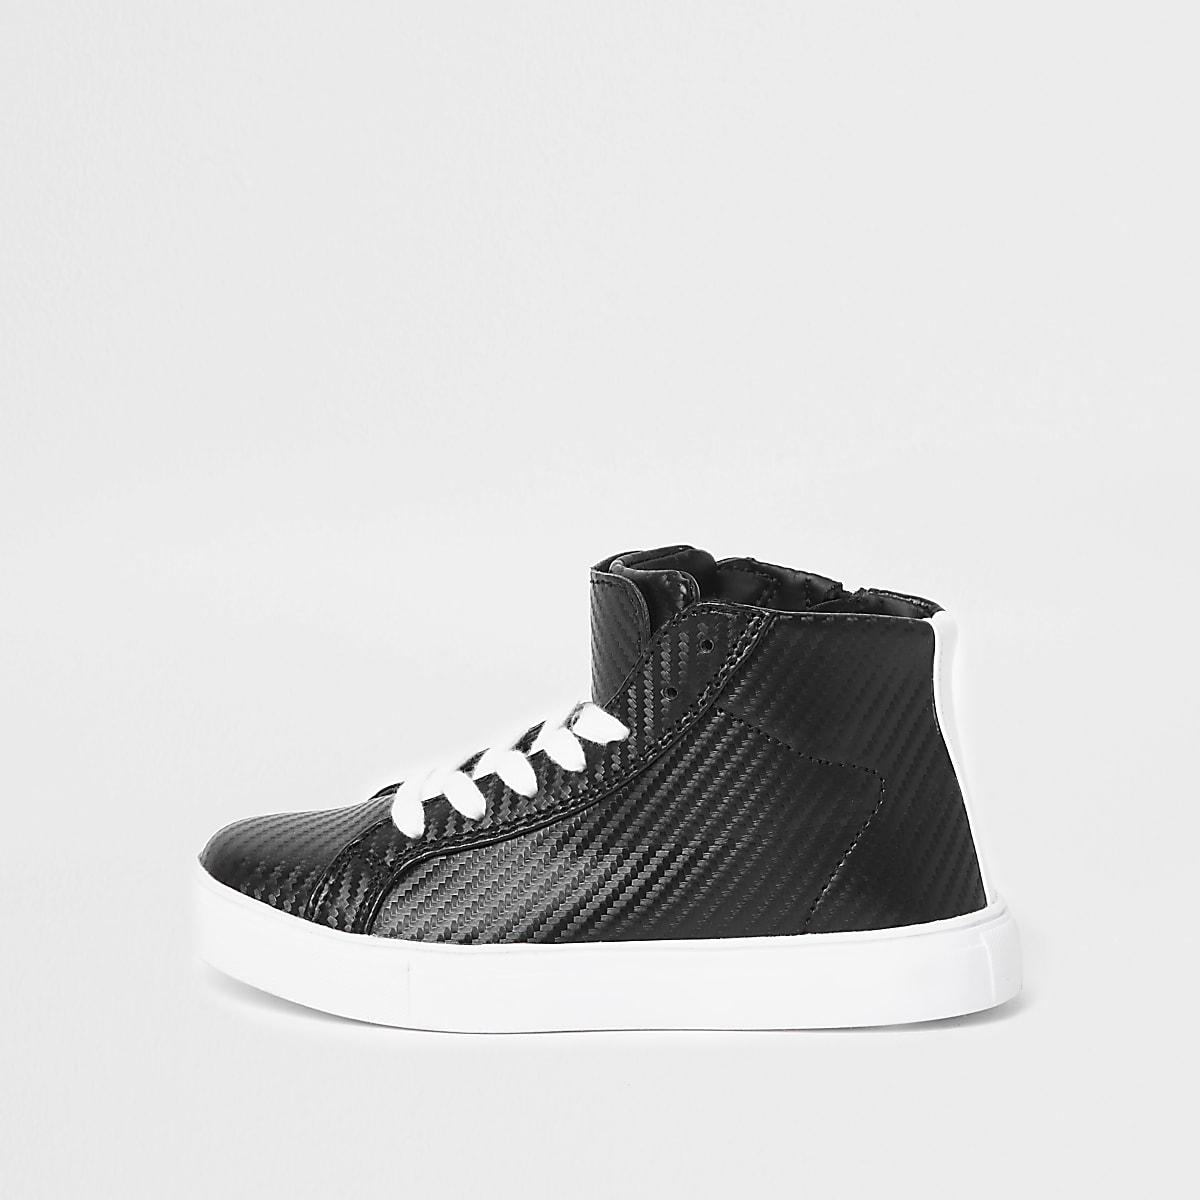 Boys black textured high top sneakers